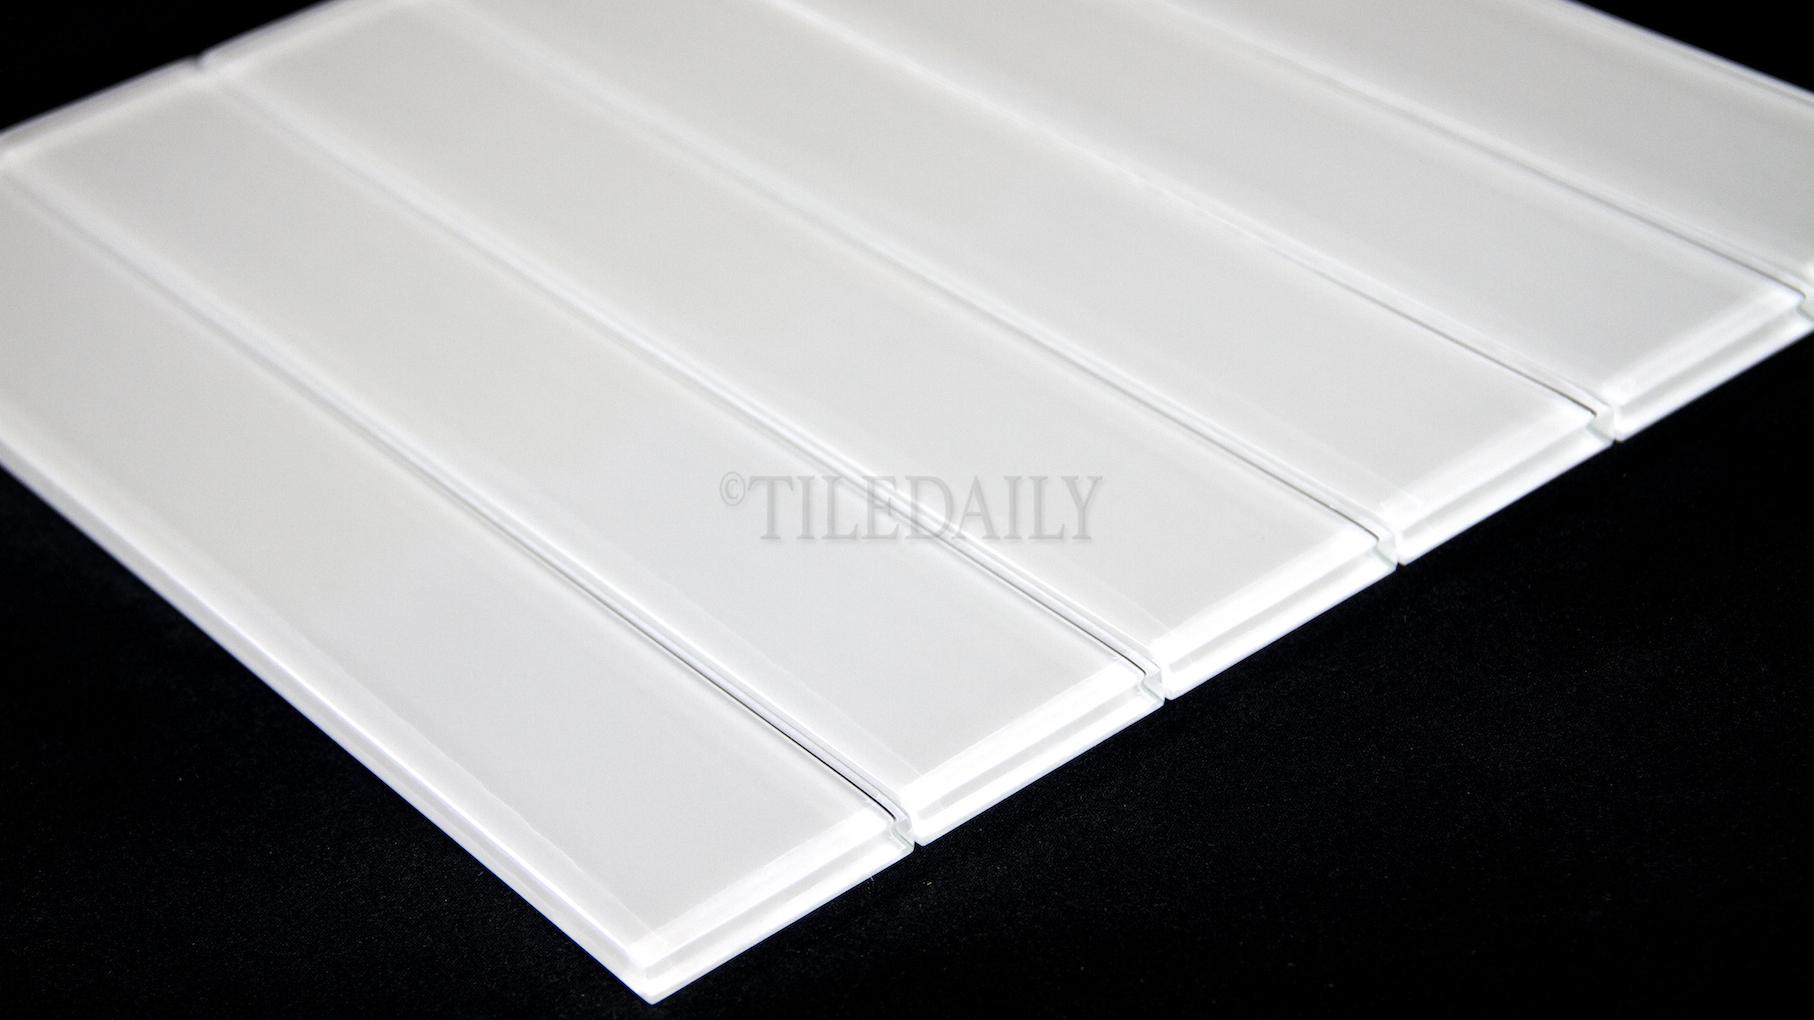 Awesome 1 X 1 Acoustic Ceiling Tiles Huge 12X12 Ceramic Tile Clean 1950S Floor Tiles 2X2 Ceiling Tiles Lowes Old 2X4 Drop Ceiling Tiles Home Depot Brown2X4 Glass Tile Backsplash Subway \u2013 Tiledaily